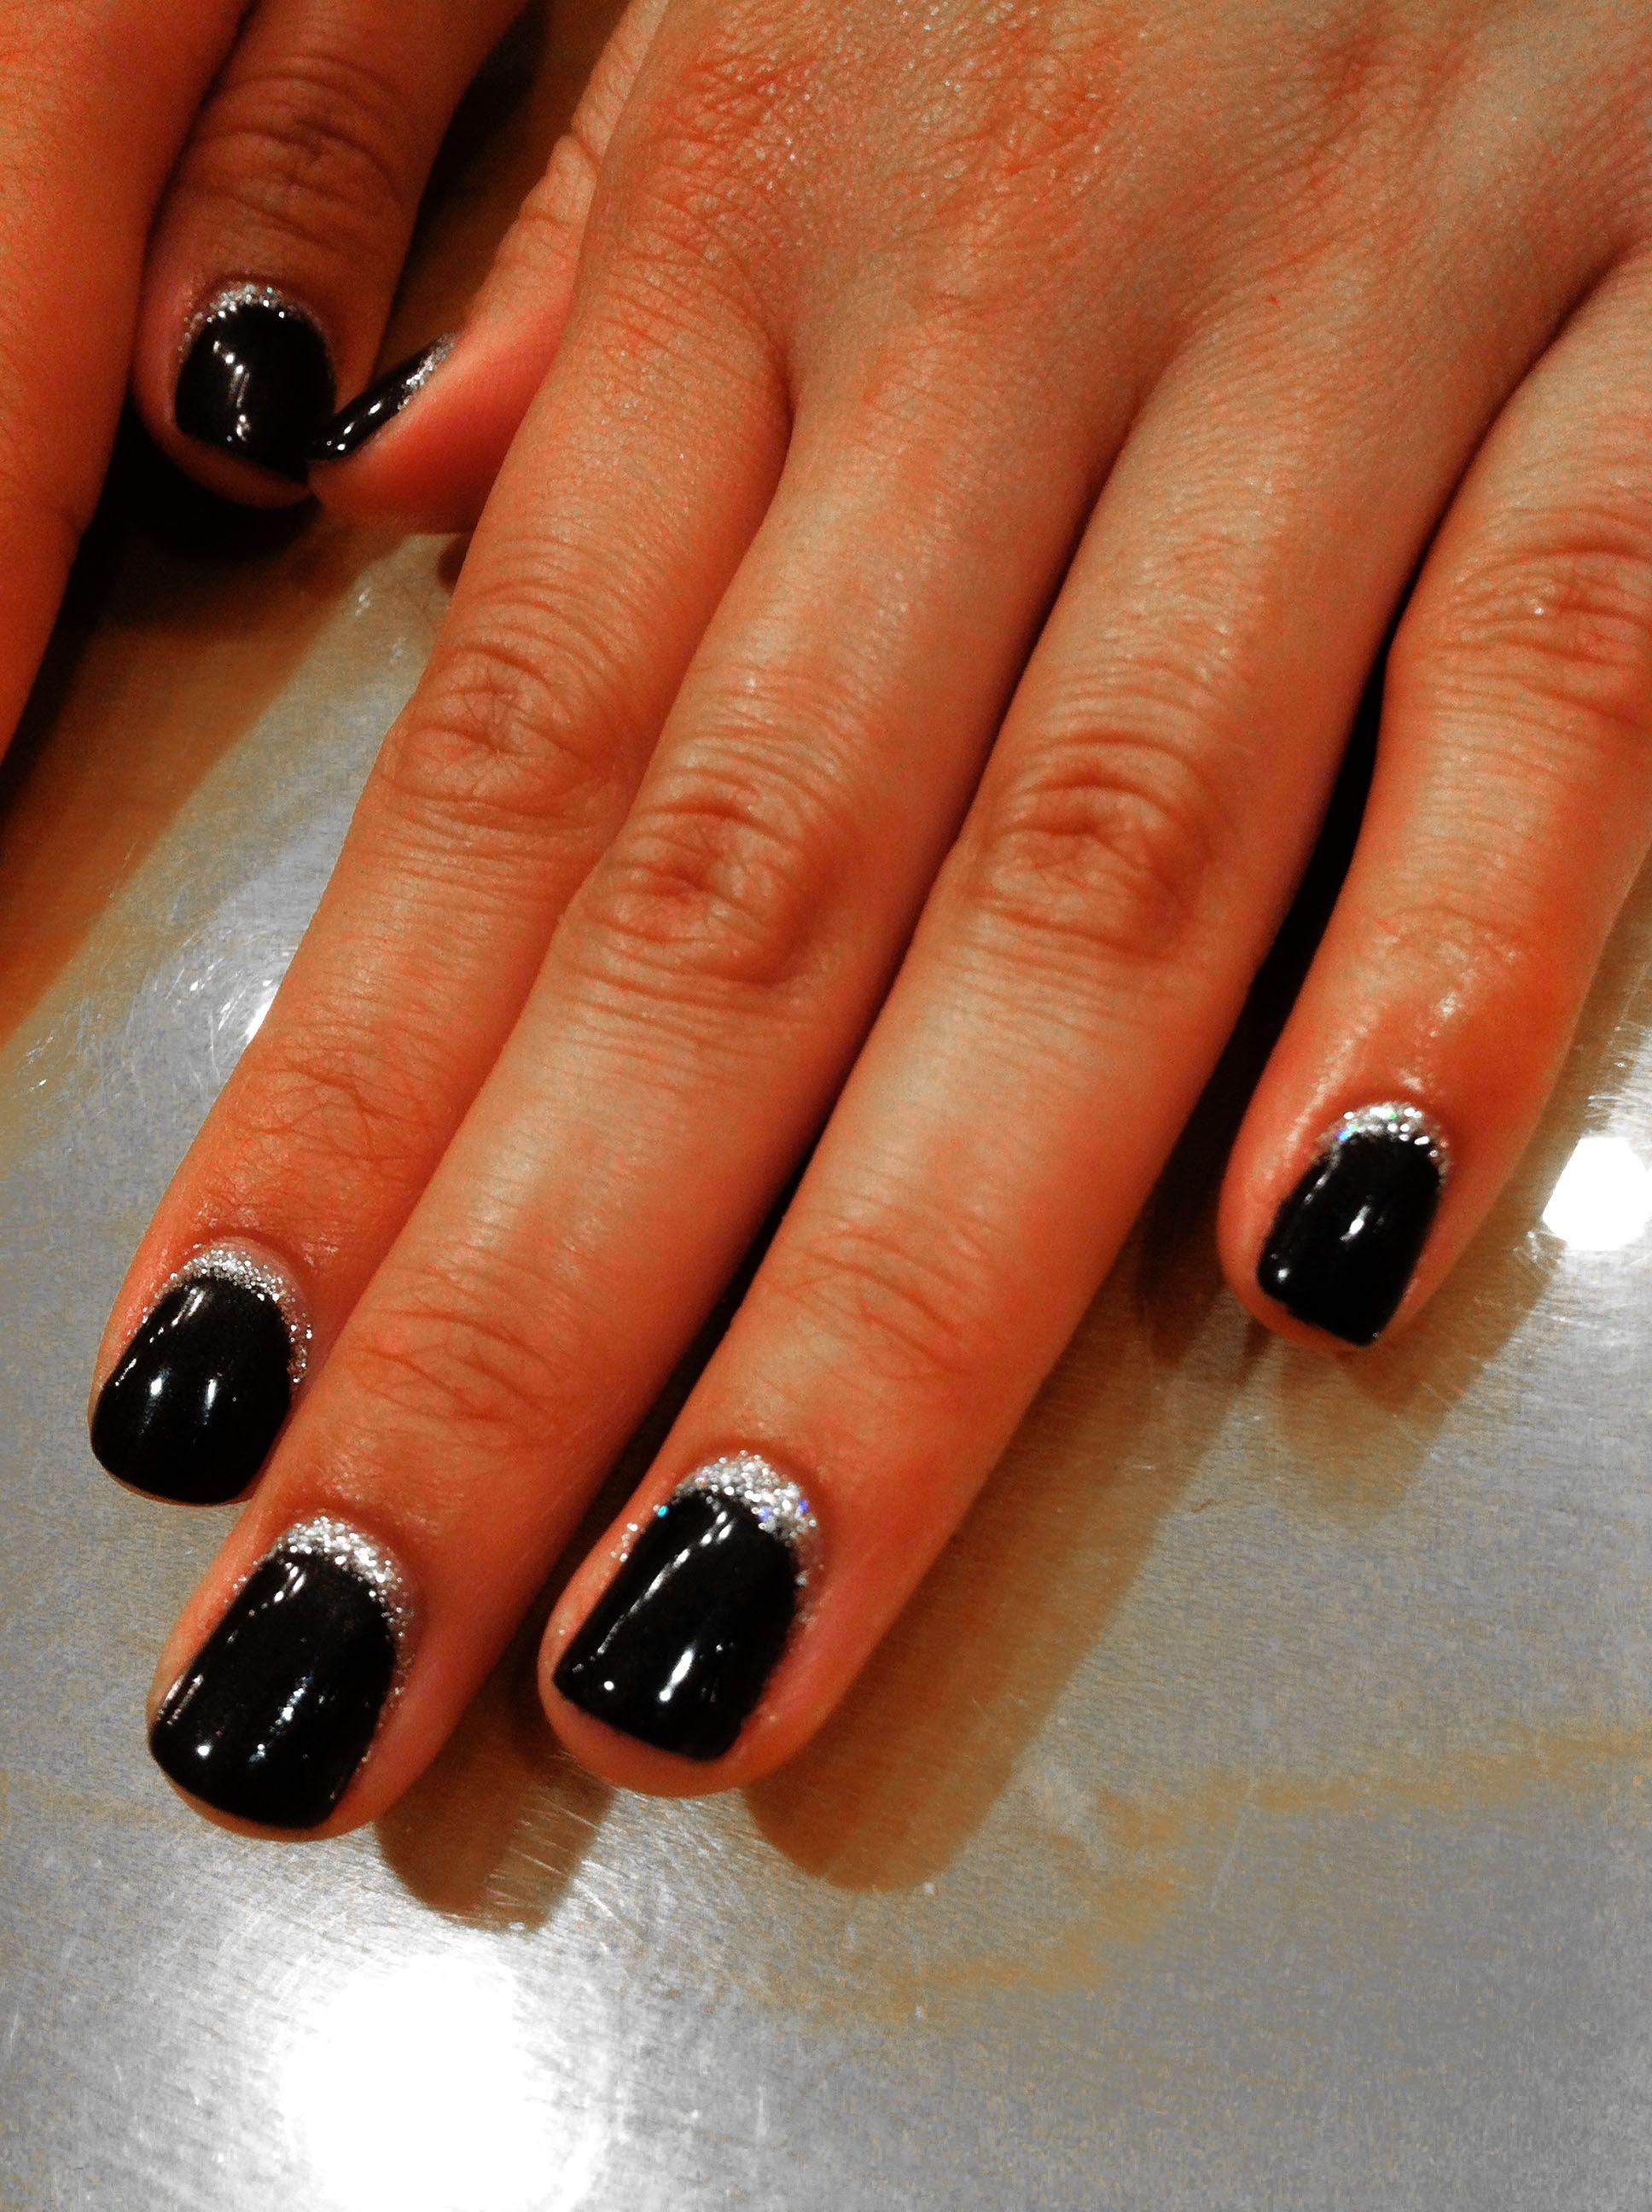 Spring Nails Saratoga - Black onyx shellec polish with gellish glitter along the cuticles